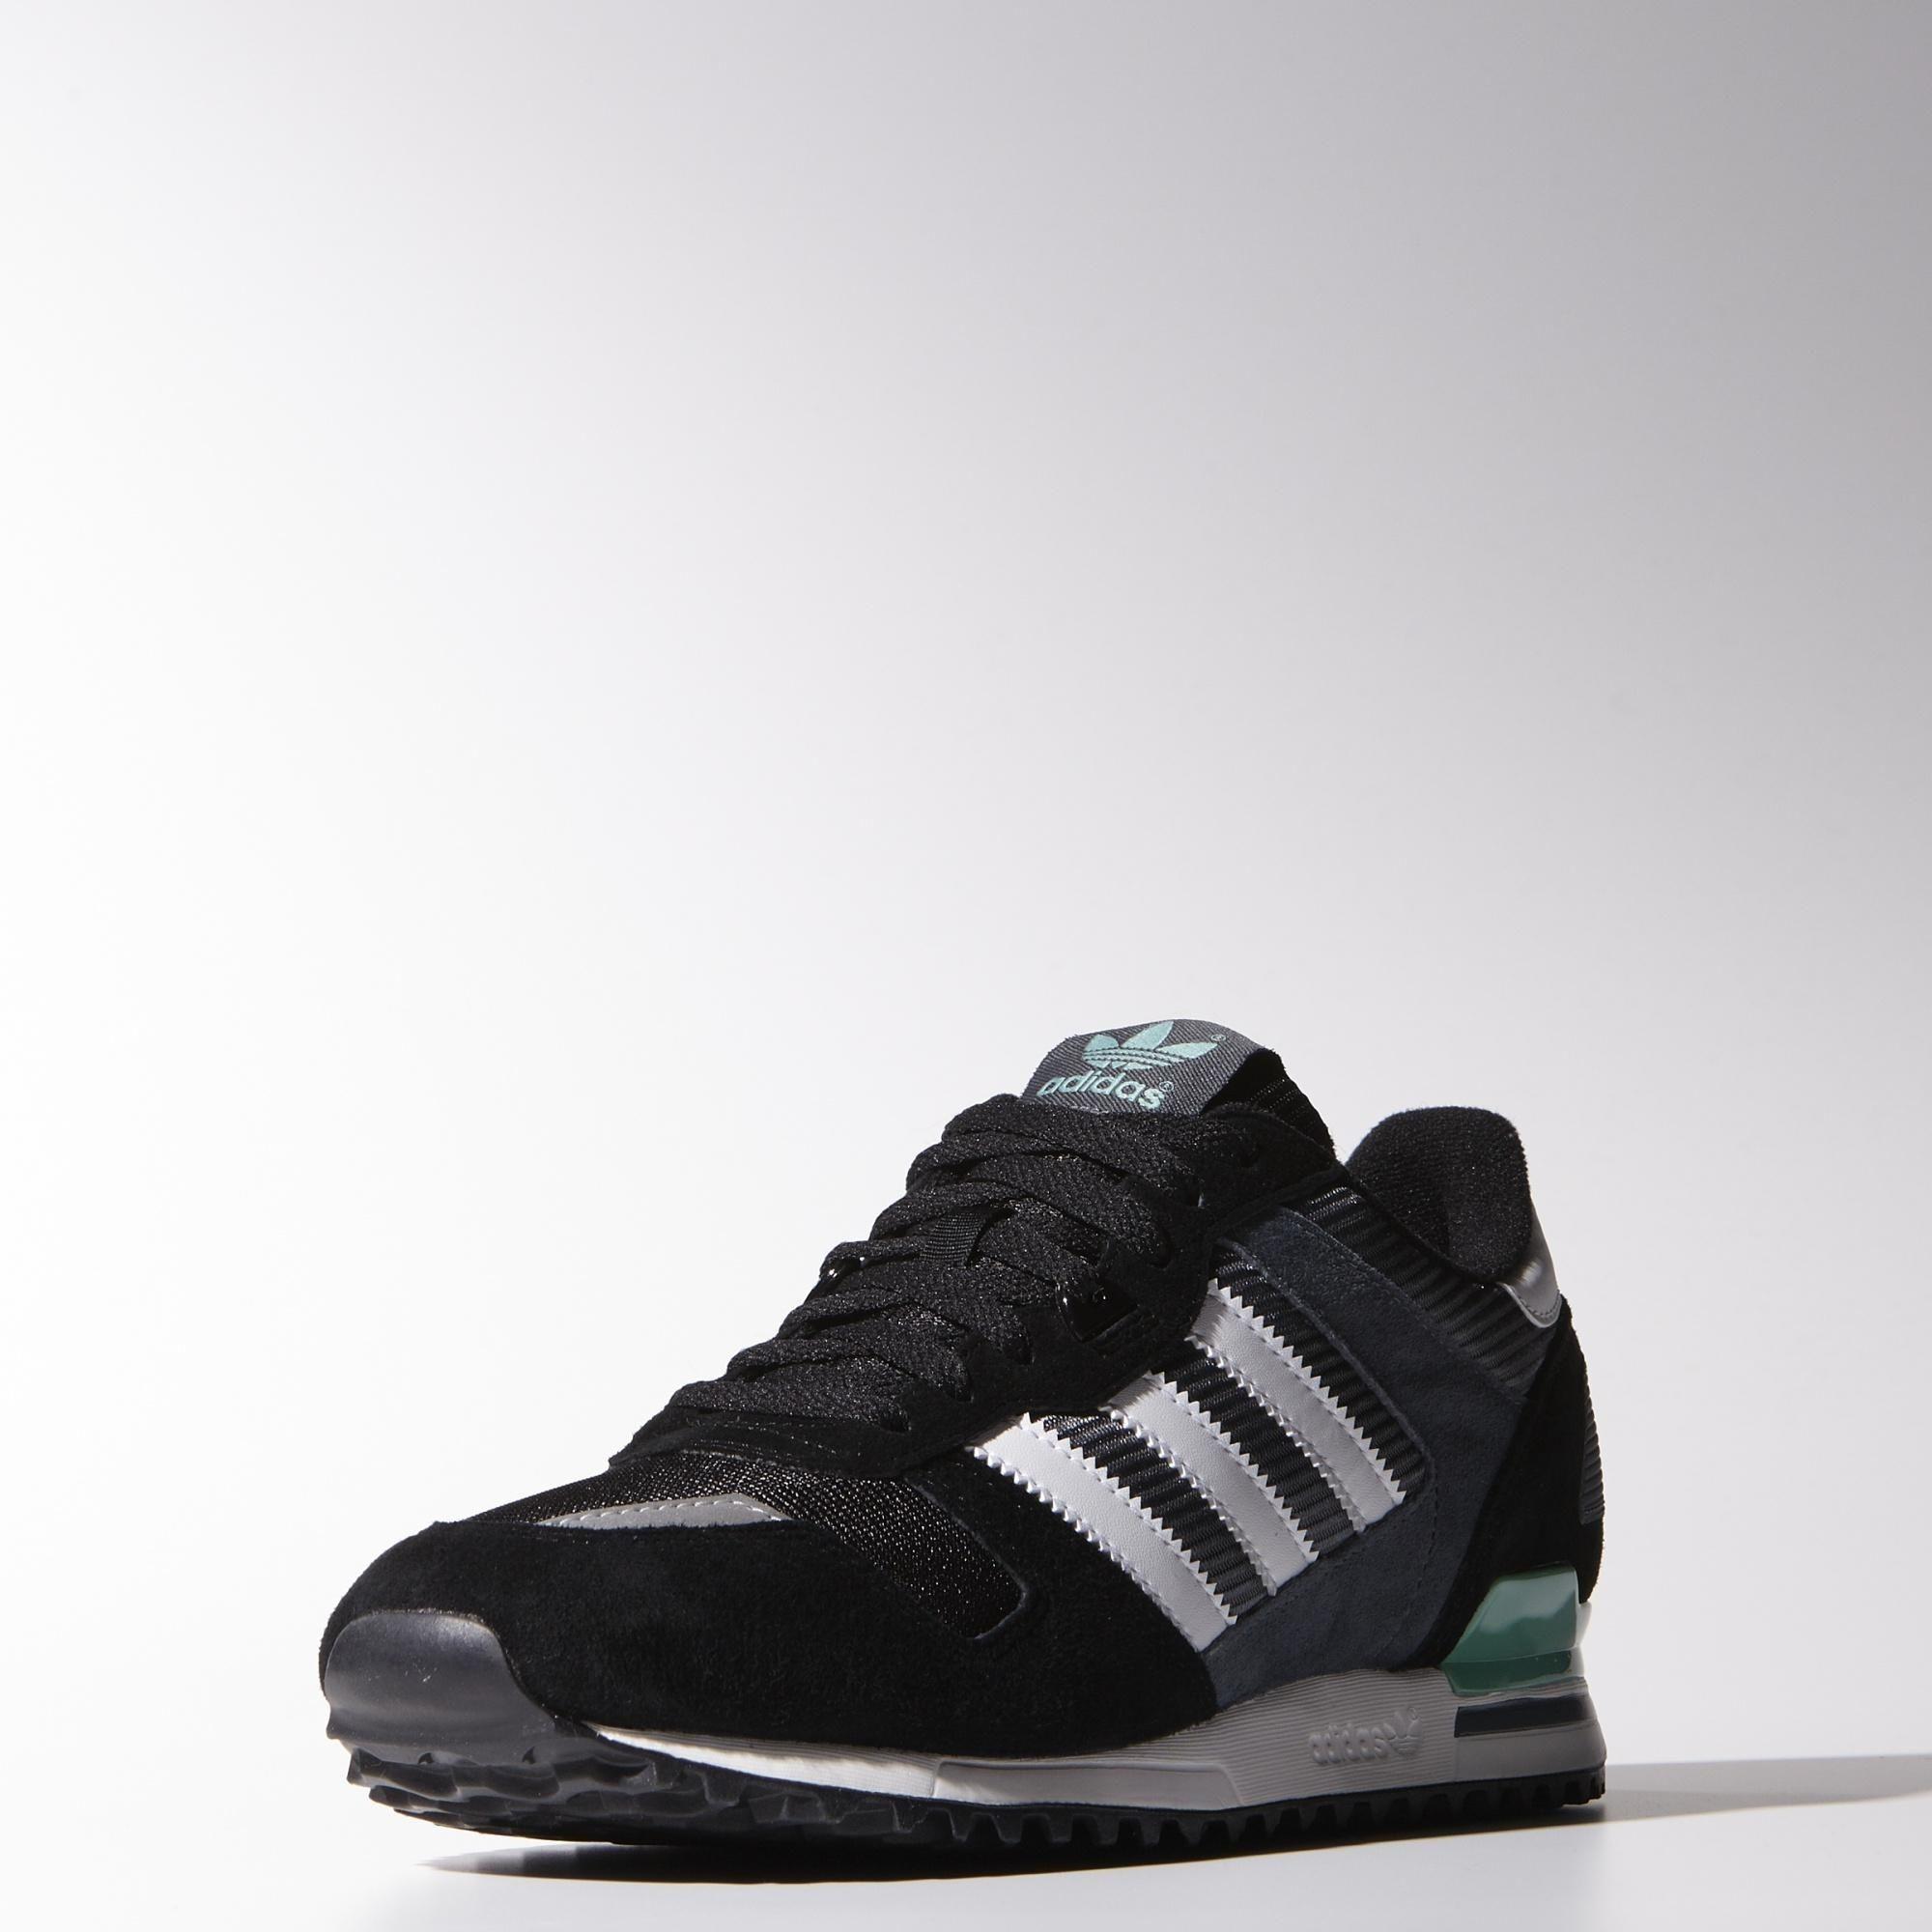 Zx 700 Fashion SchoenenNederland Adidas Men's kZuTOXPi